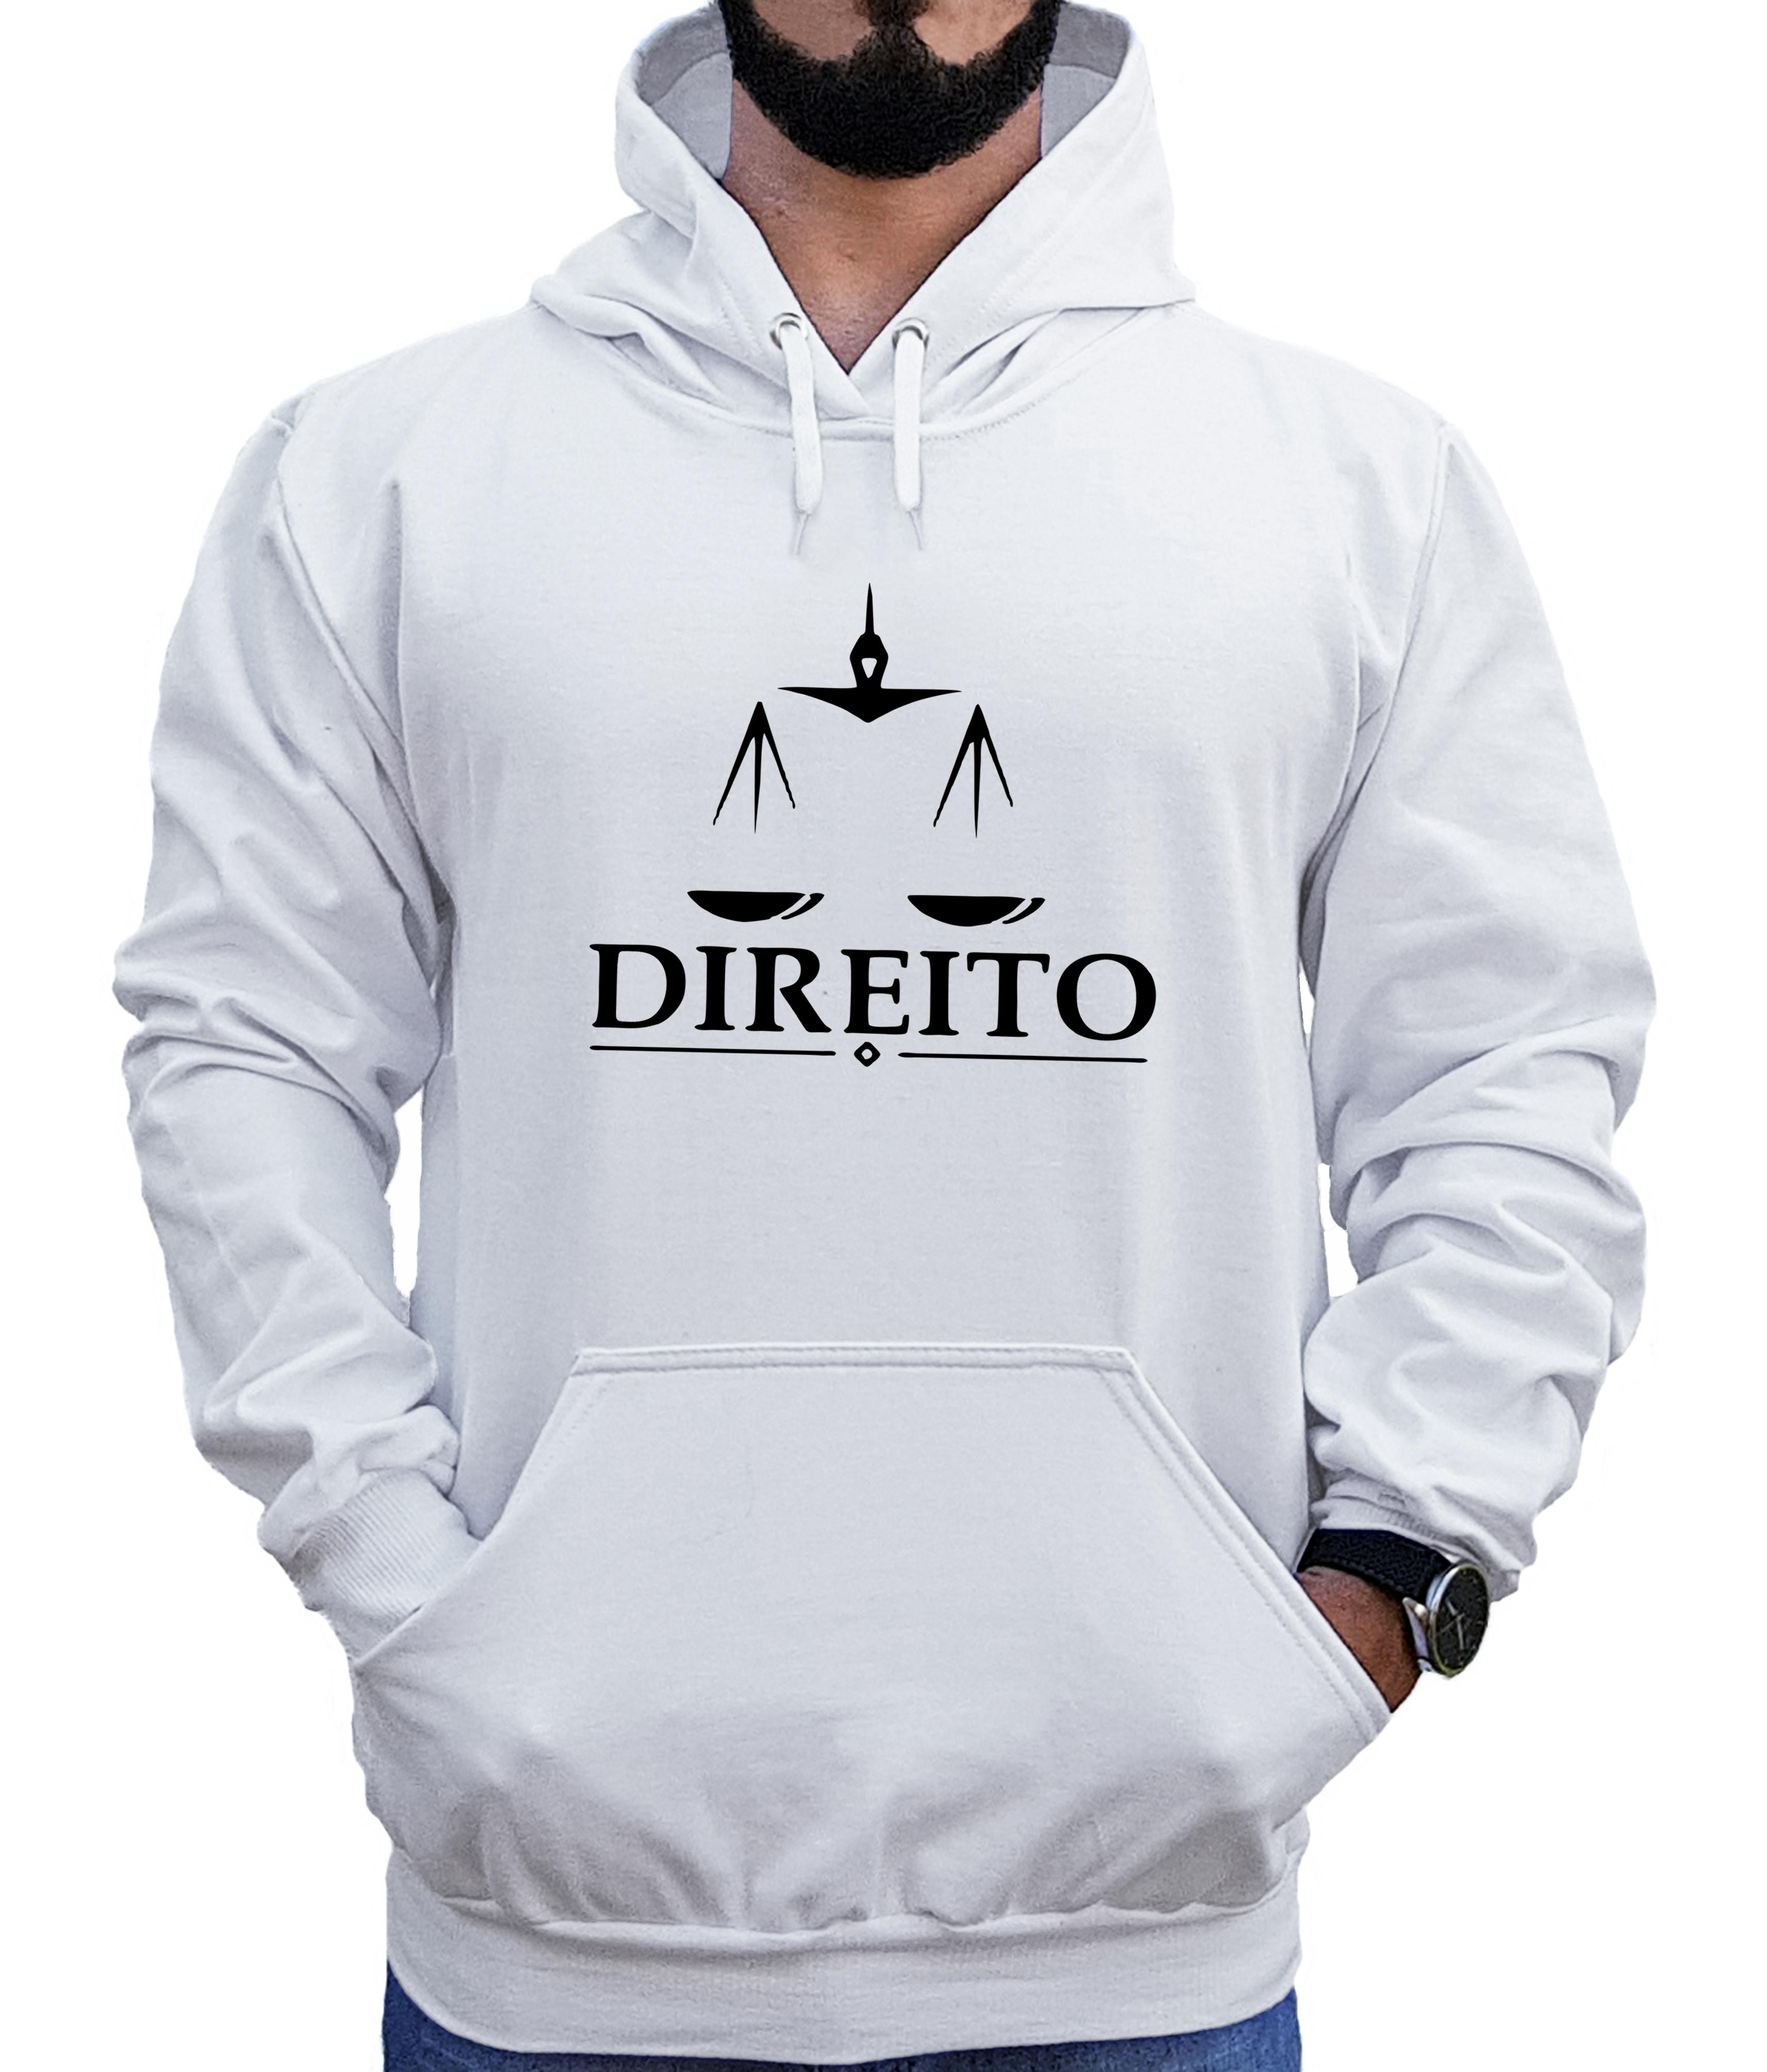 d003b169b101c4 Blusa Moletom Liso Capuz Bolsos Moleton Branco Preto Cinza | Elo7